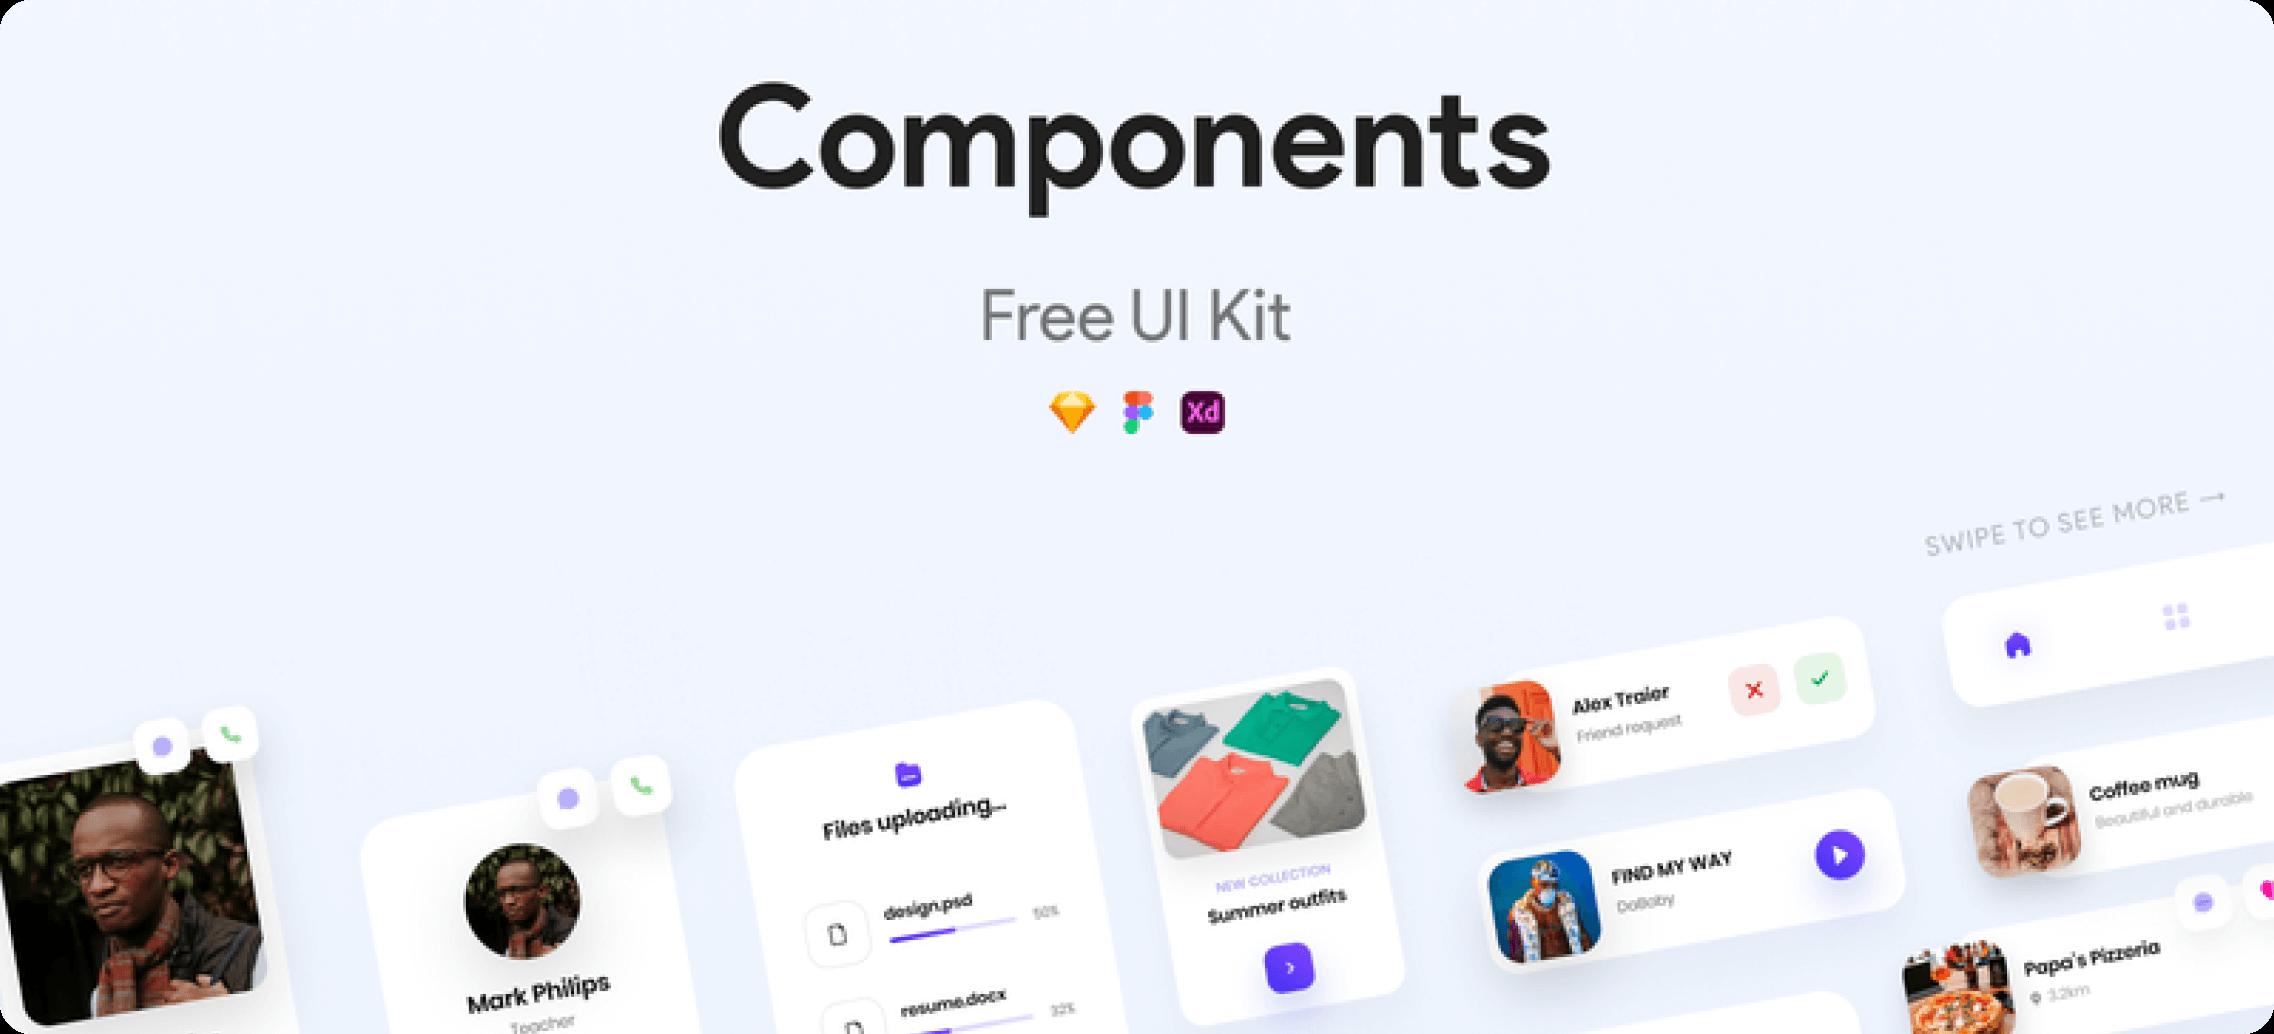 Components UI sample components.